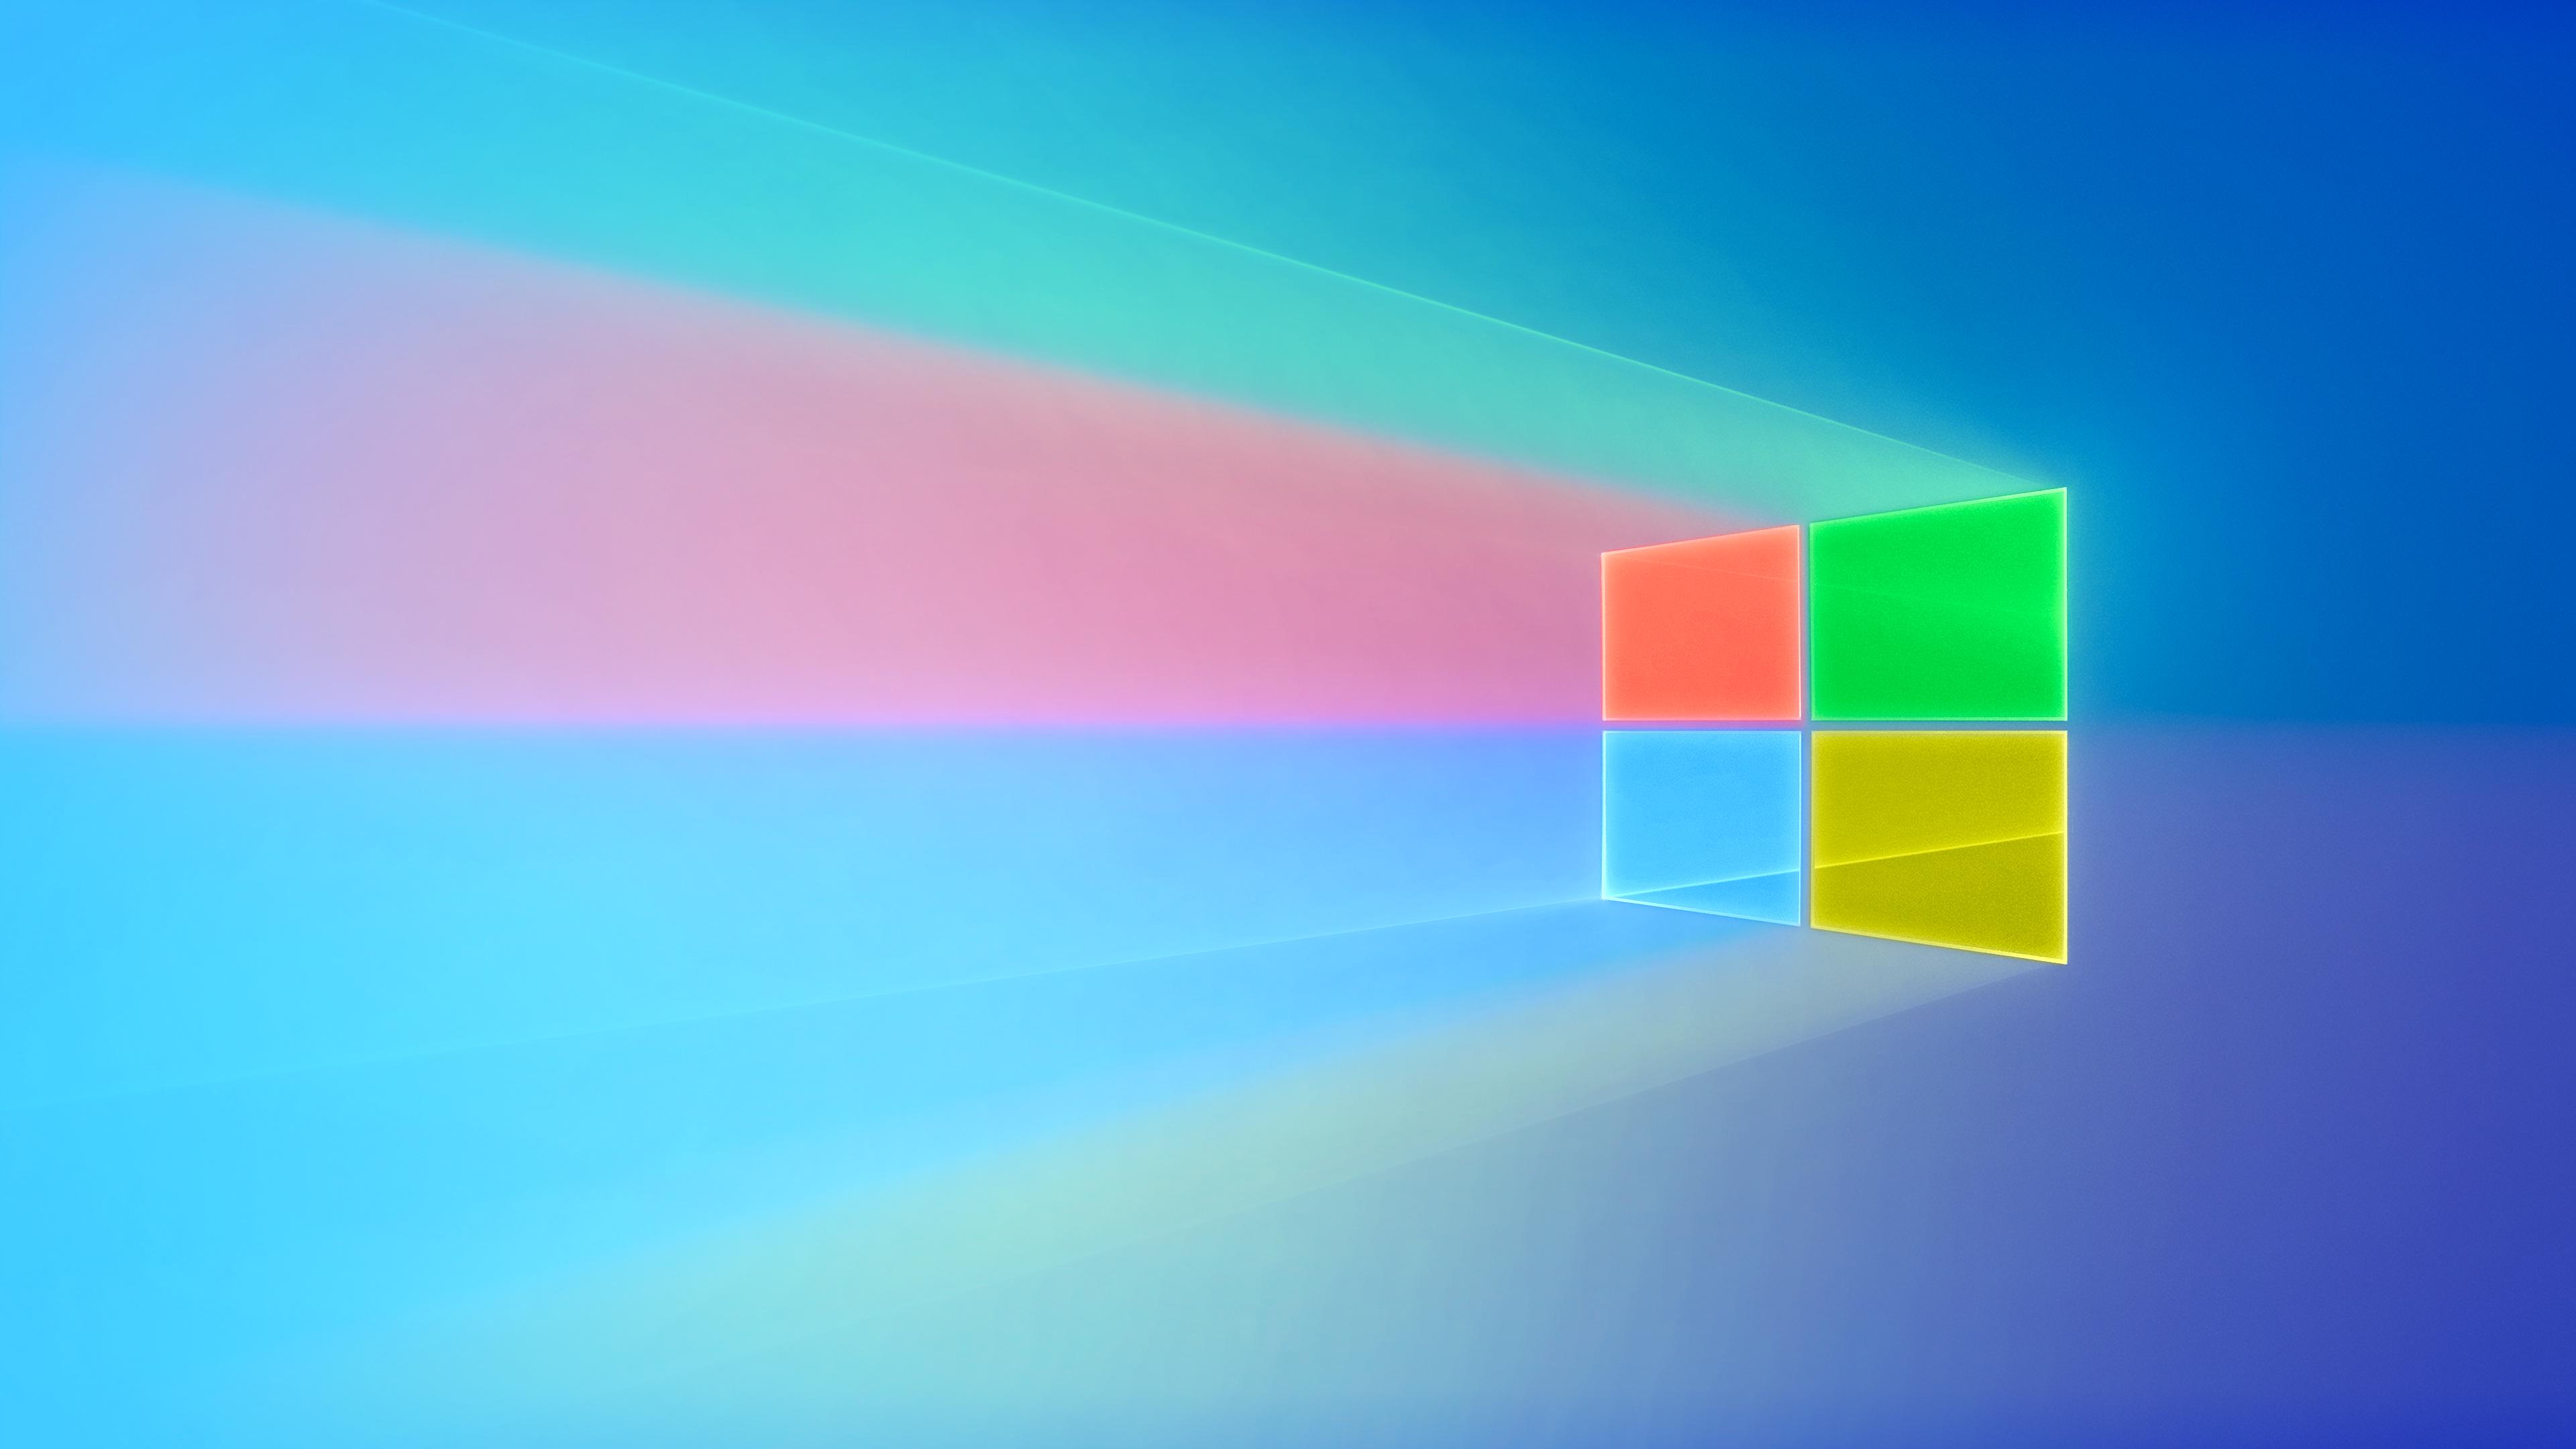 Windows 10 4k Ultra Hd Wallpaper Background Image